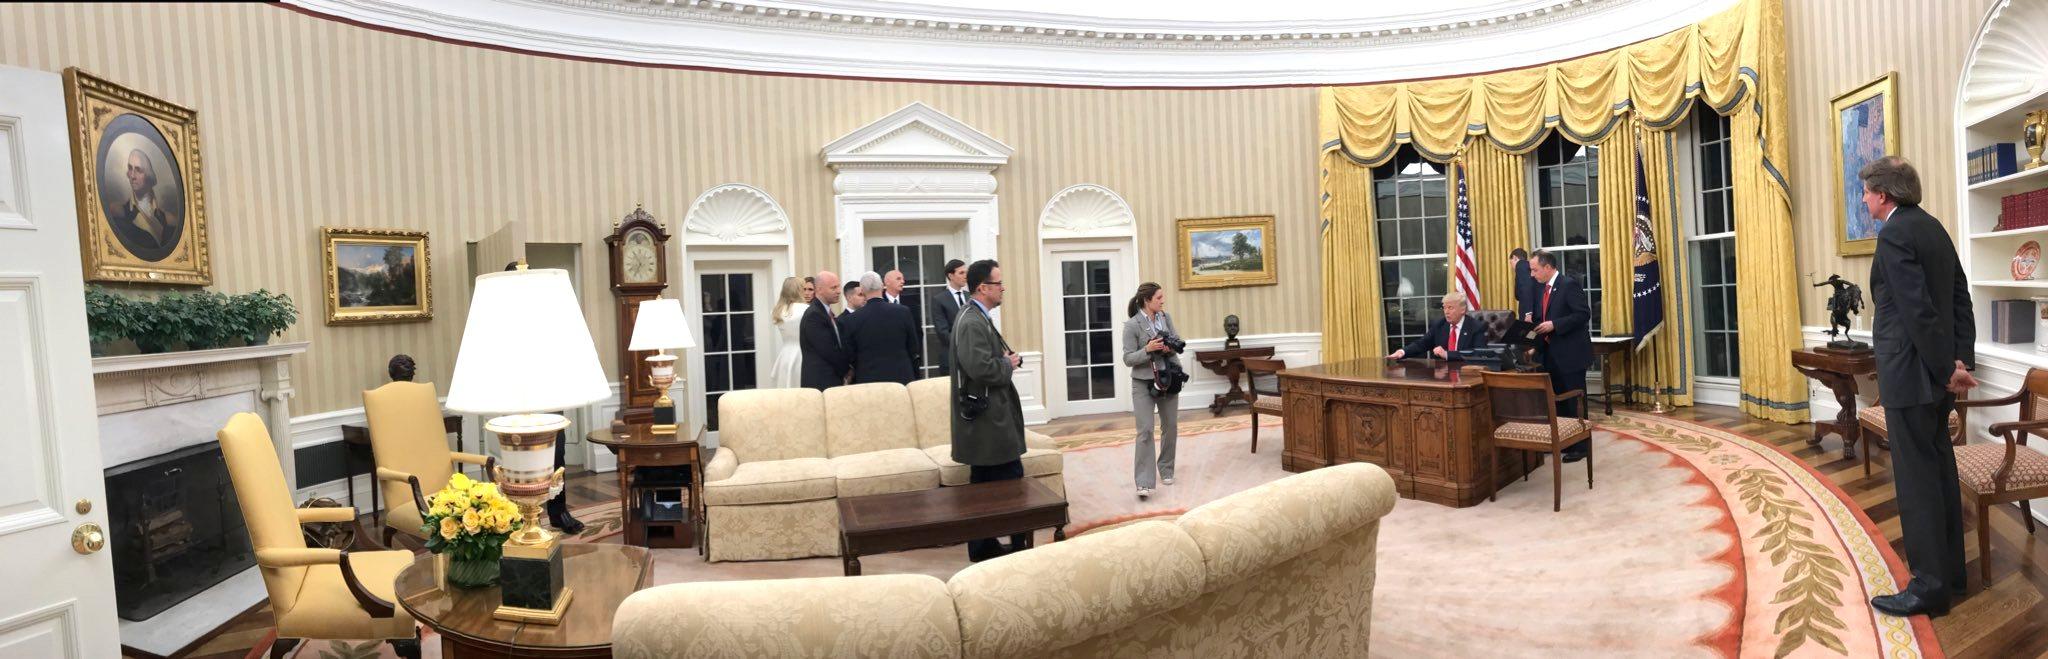 Cote De Texas President Trump S New Oval Office Decor